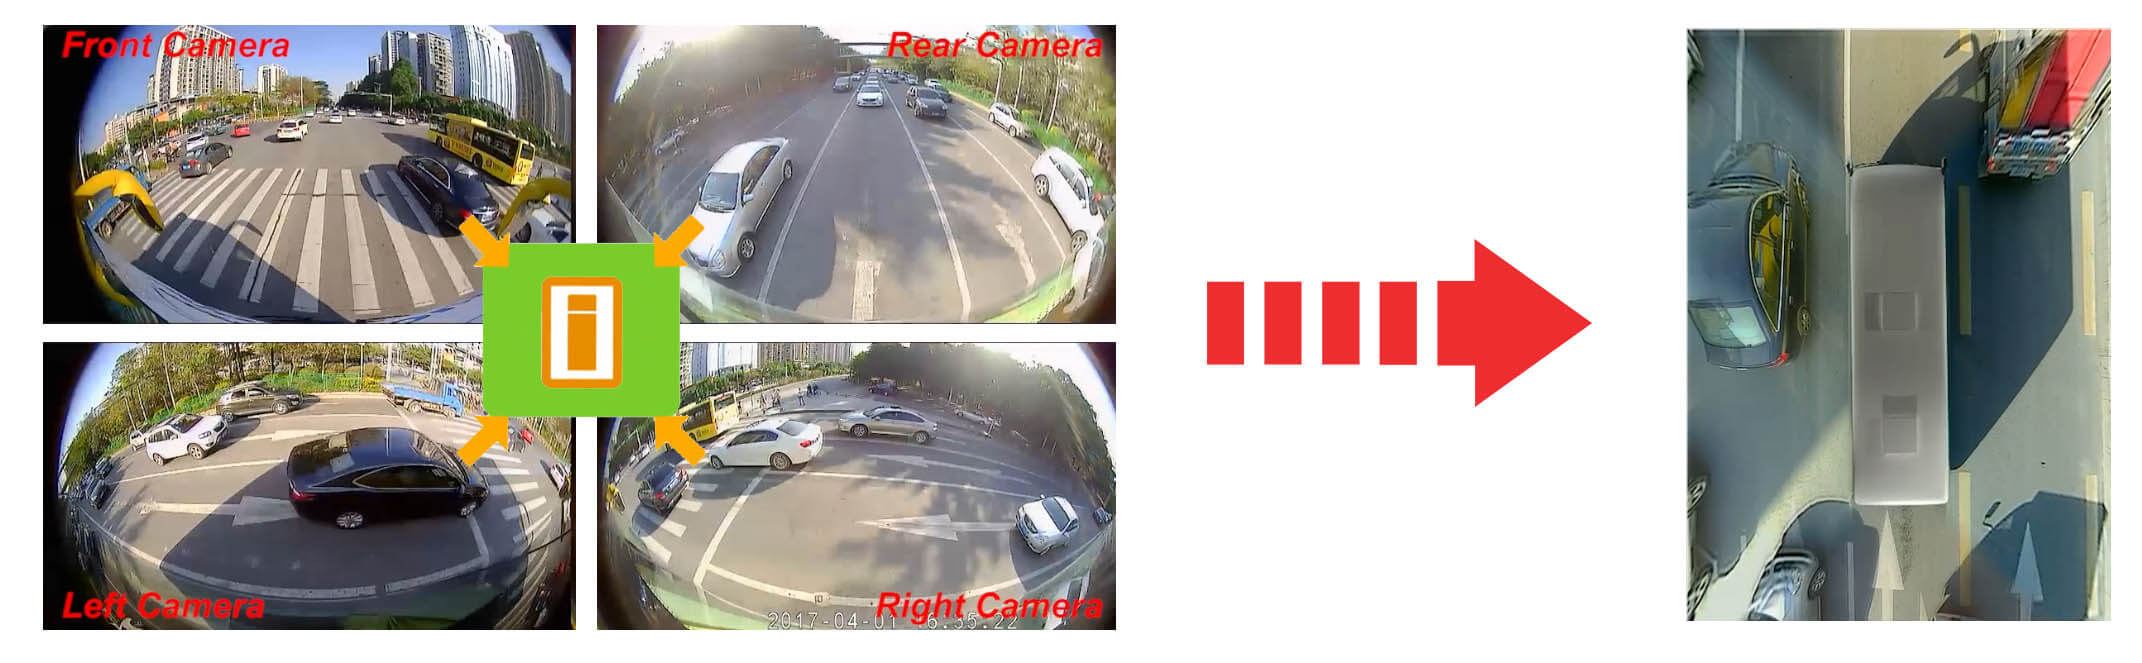 360-degree images merged